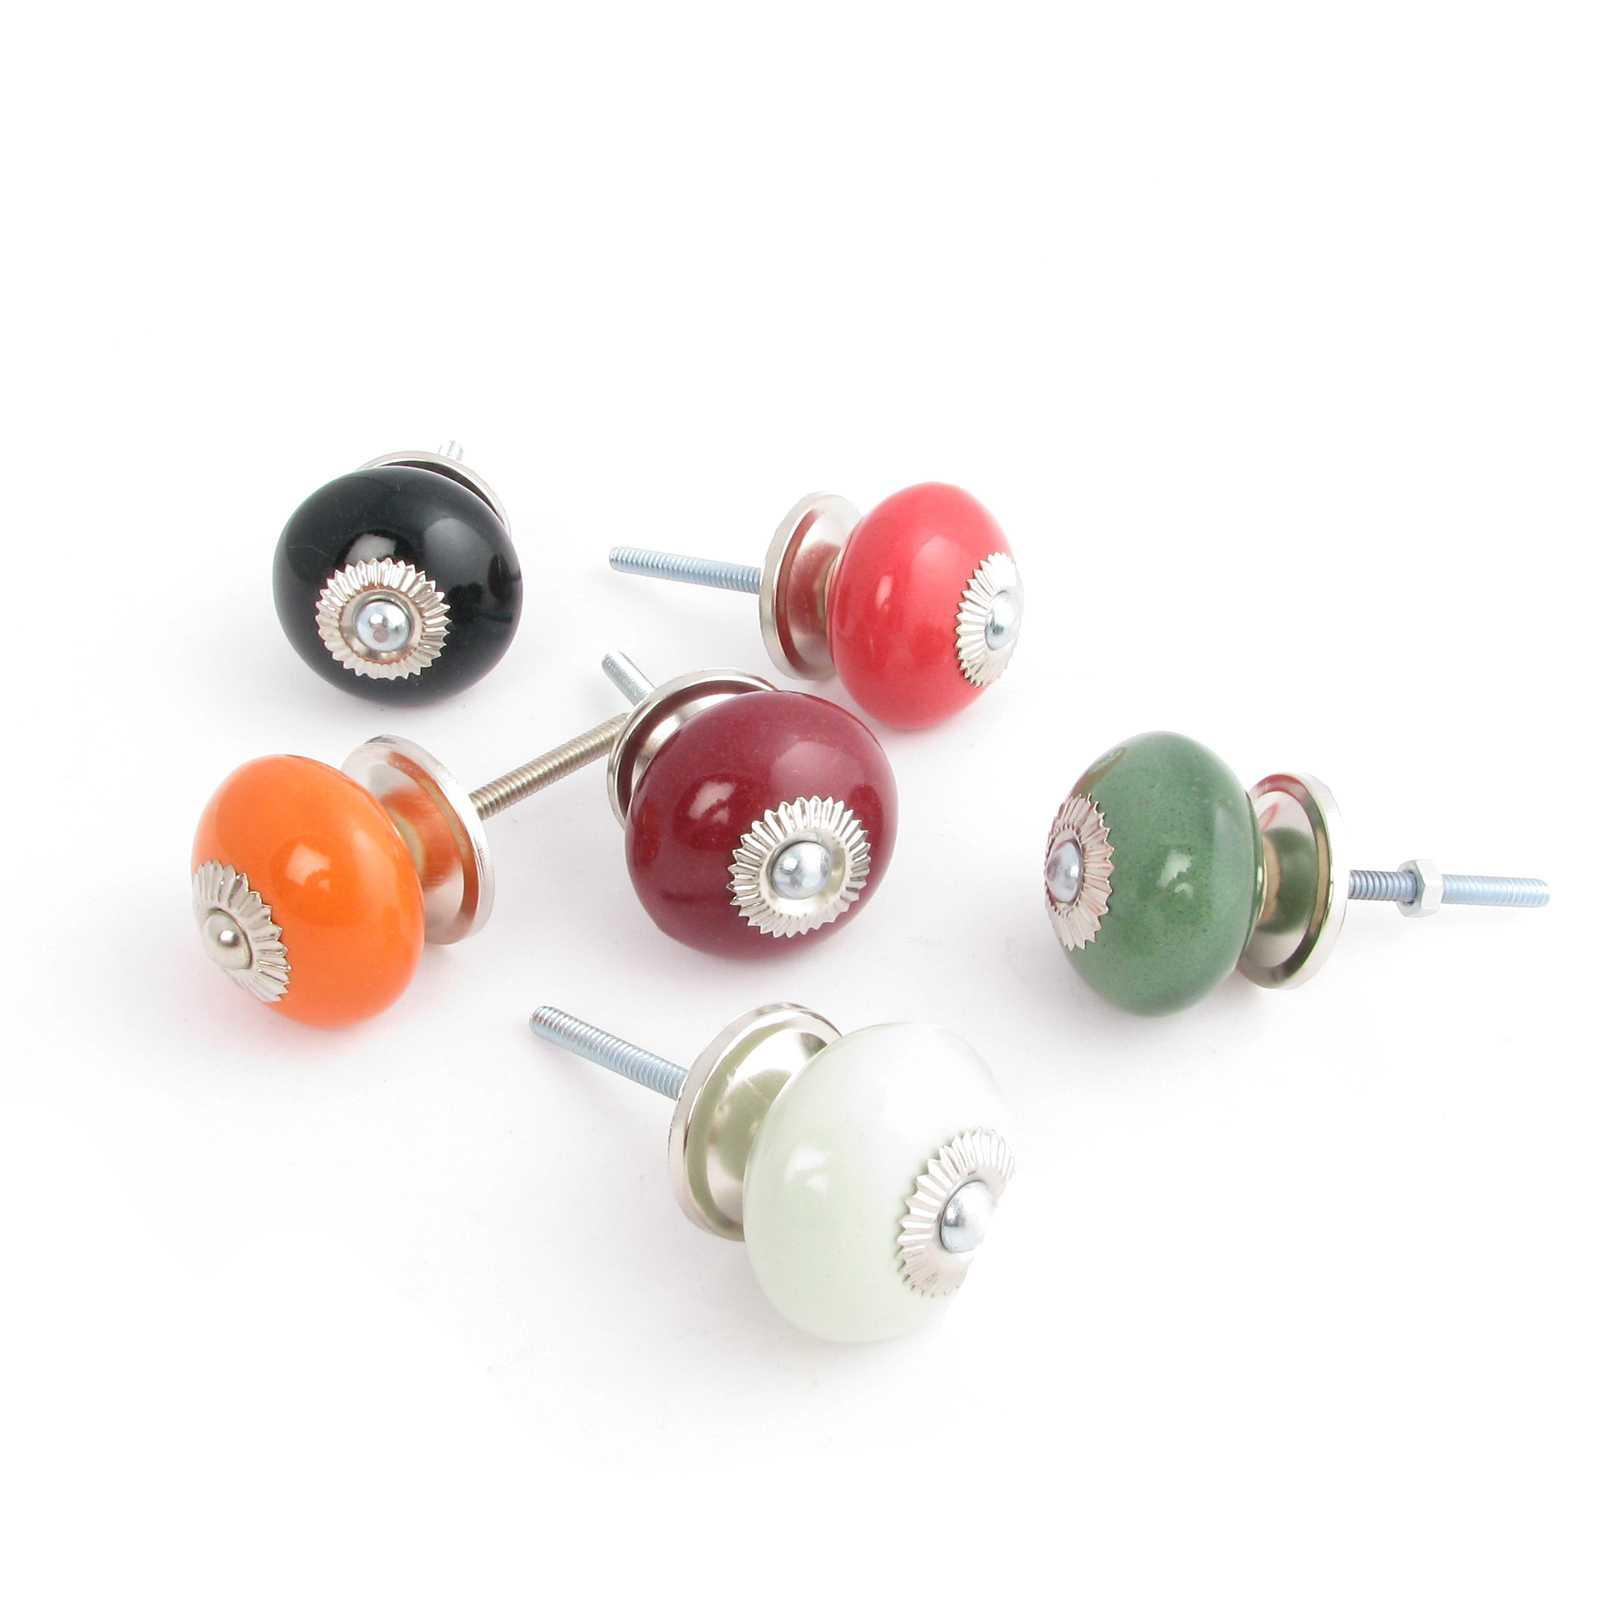 closet door knobs decorative photo - 12